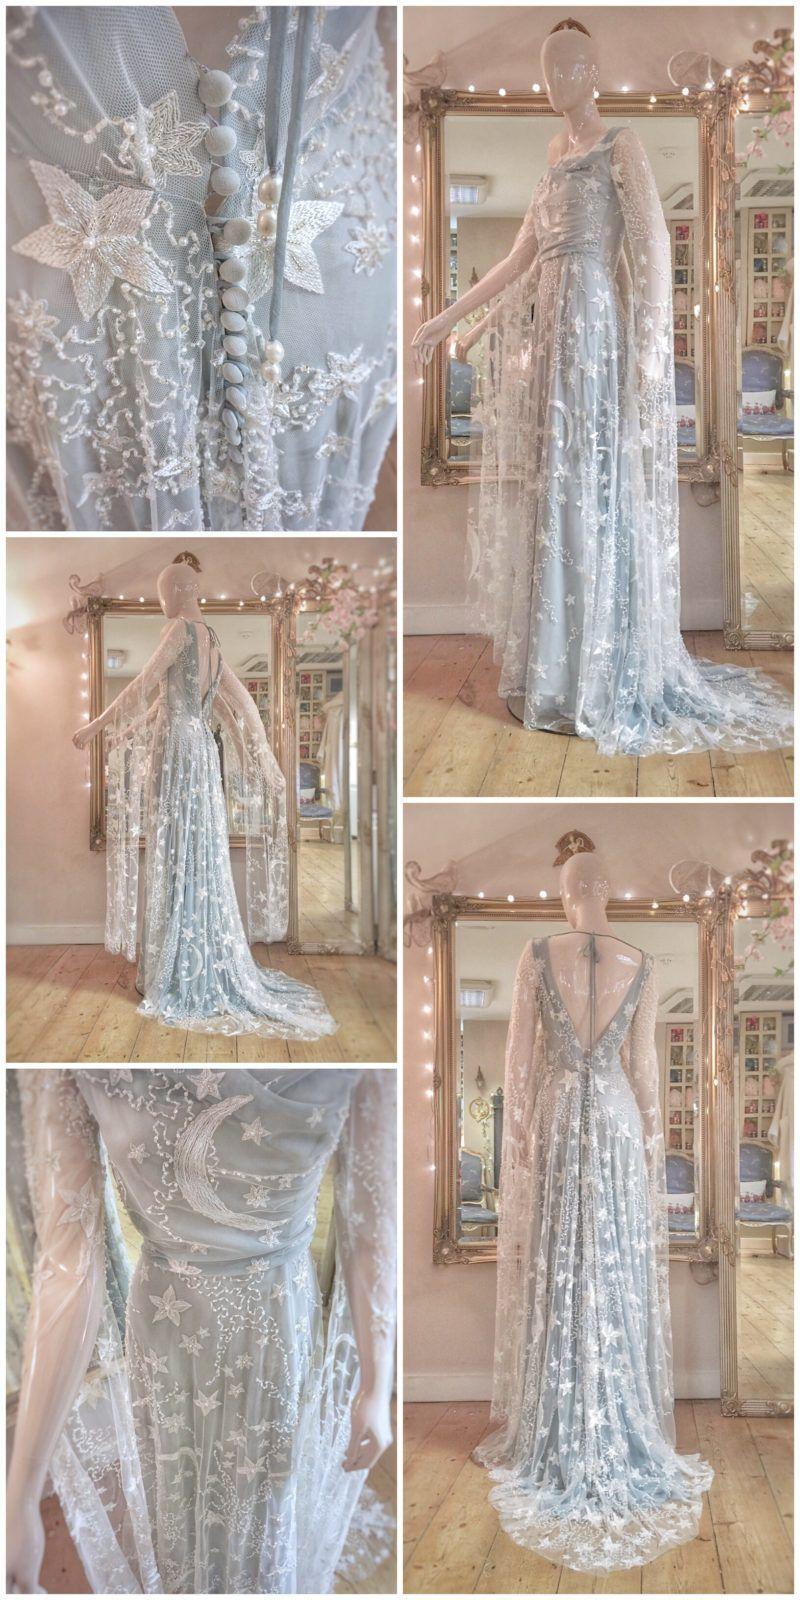 Hello Moon Star Embroidered Blue Wedding Dress Medieval Wedding Dress Embroidered Wedding Dress Fairy Tale Wedding Dress [ 1600 x 800 Pixel ]